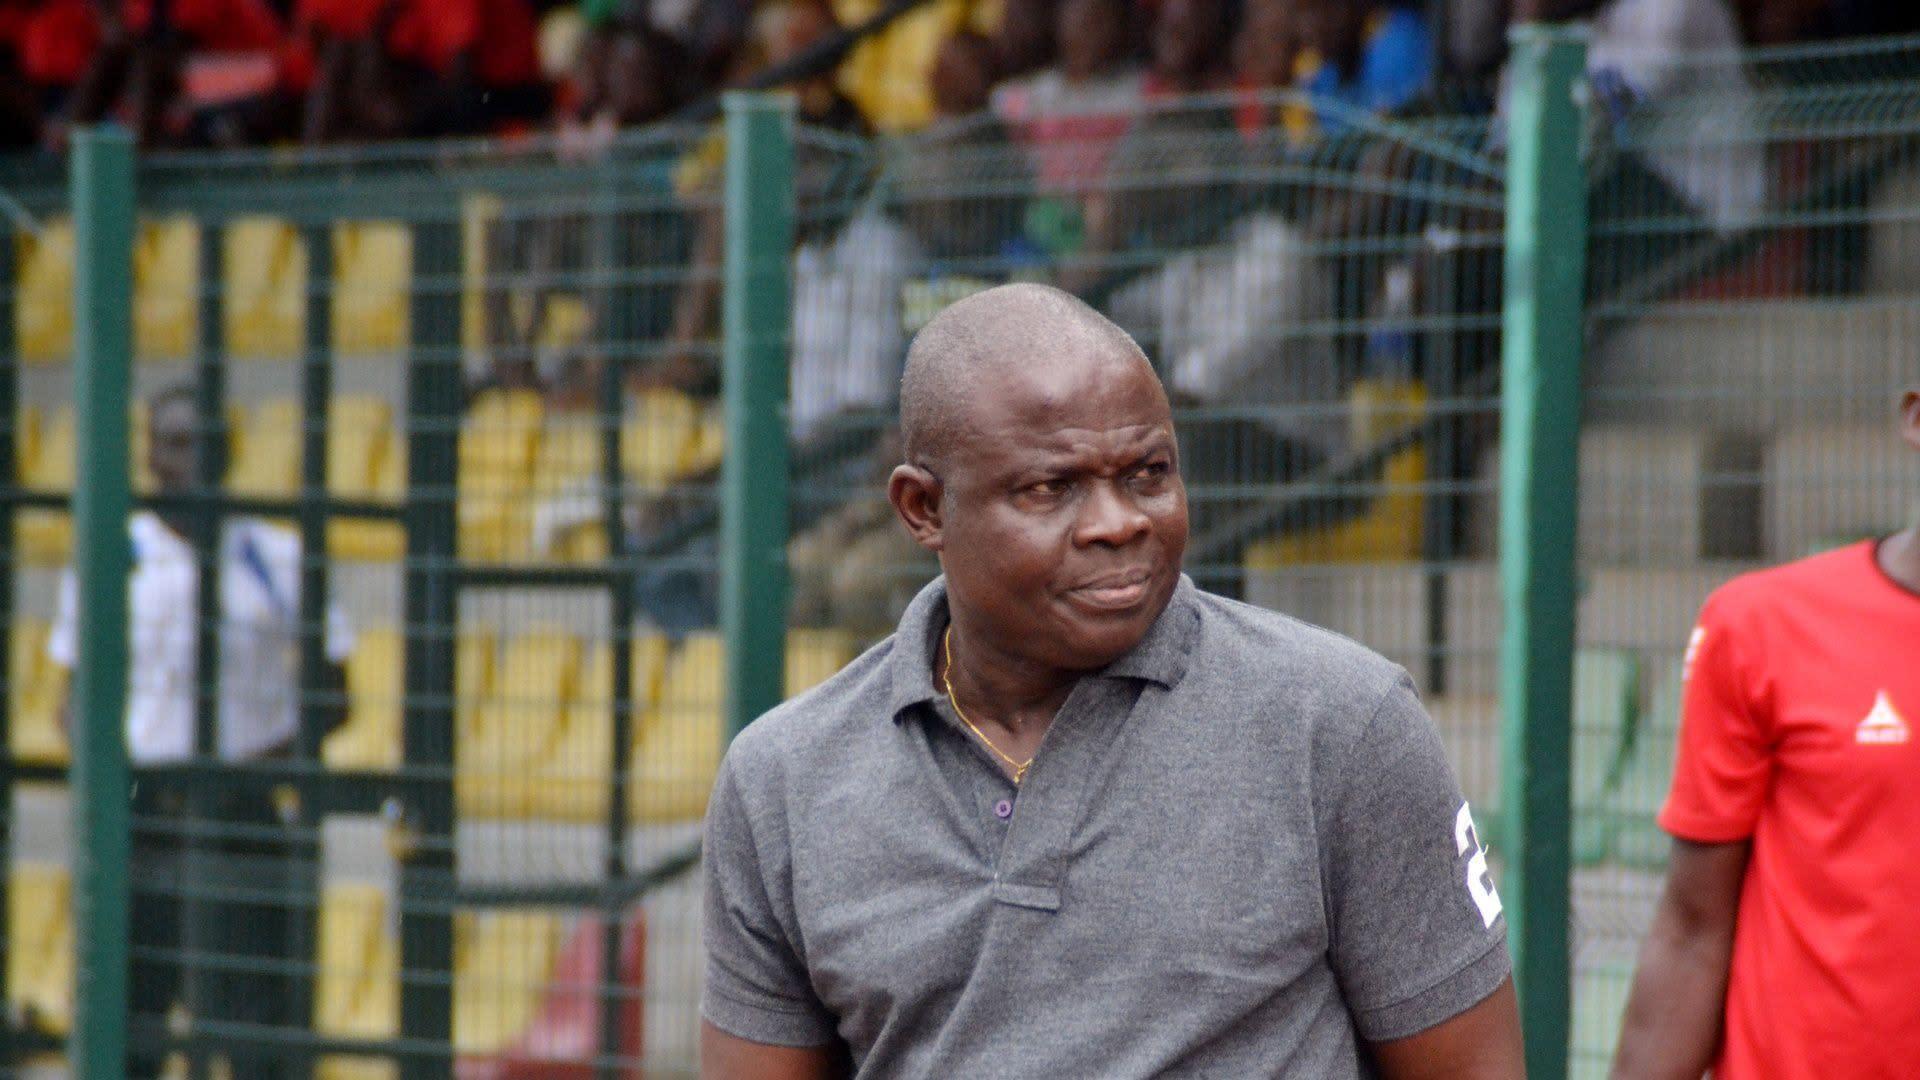 Enugu Rangers hire caretaker manager as Gbenga Ogunbote exits club - Yahoo Sports